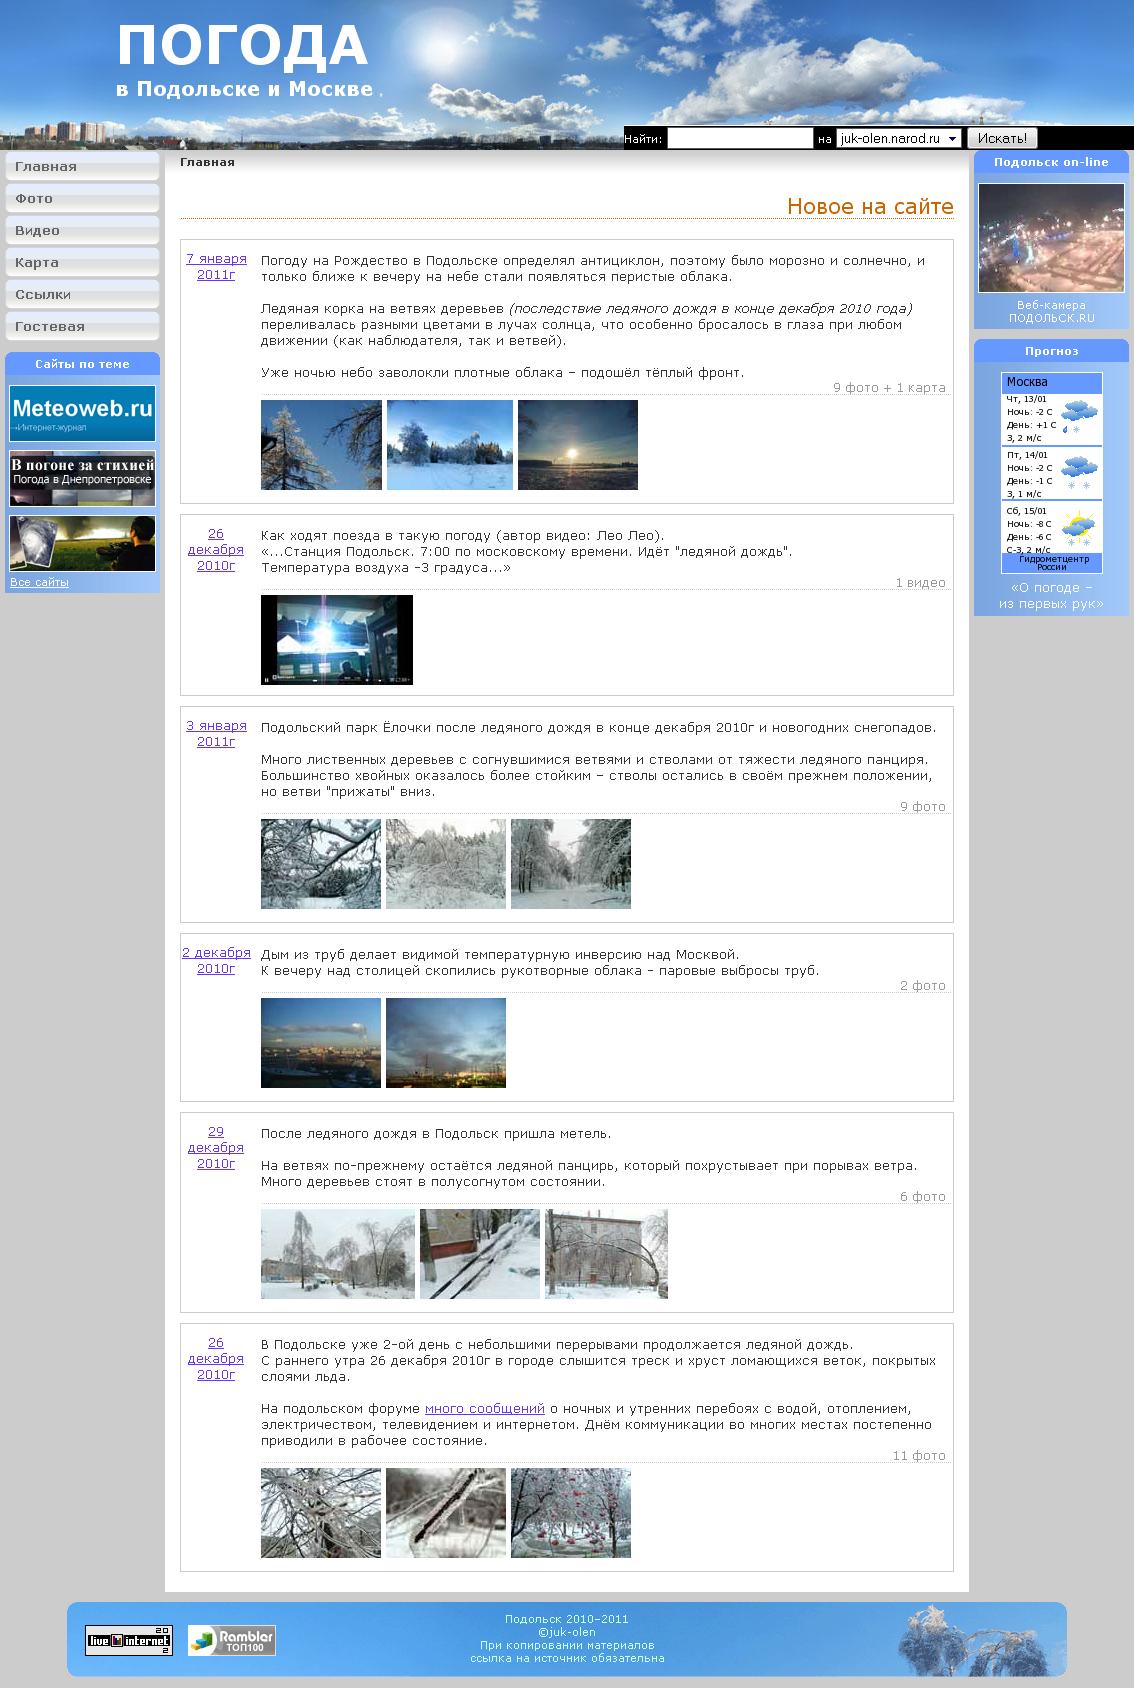 Погода в судаке на месяц и температура воды